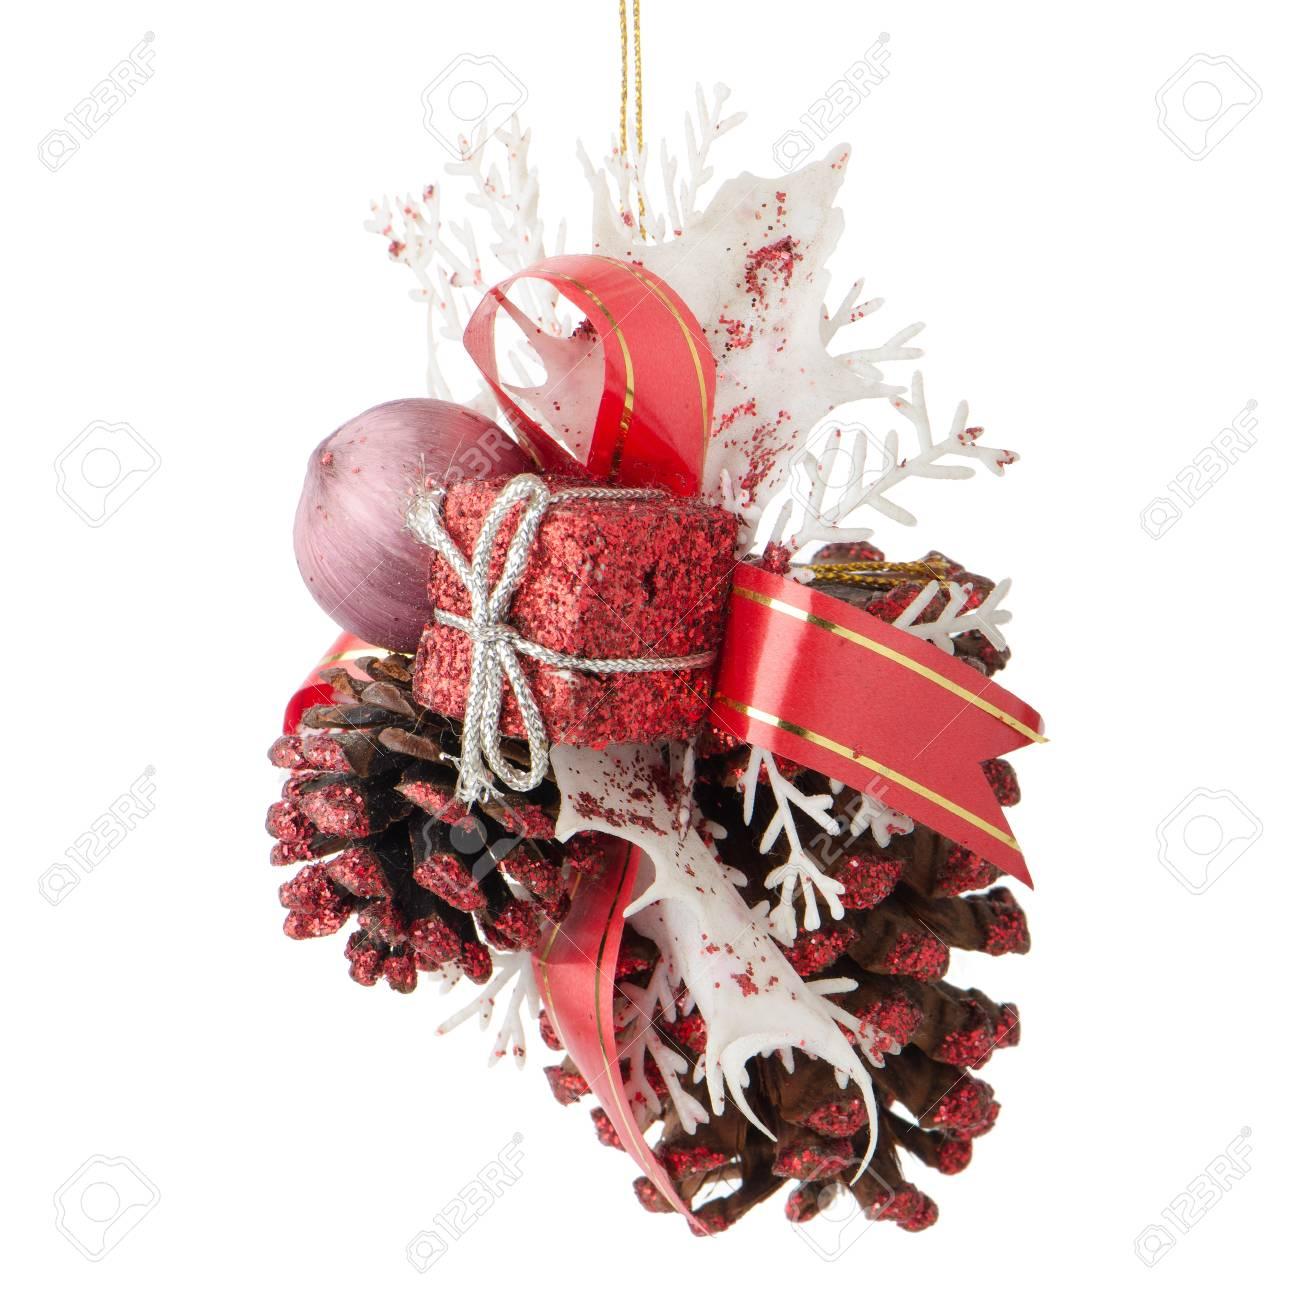 Christmas decorations on white reflective background. Stock Photo - 16206491